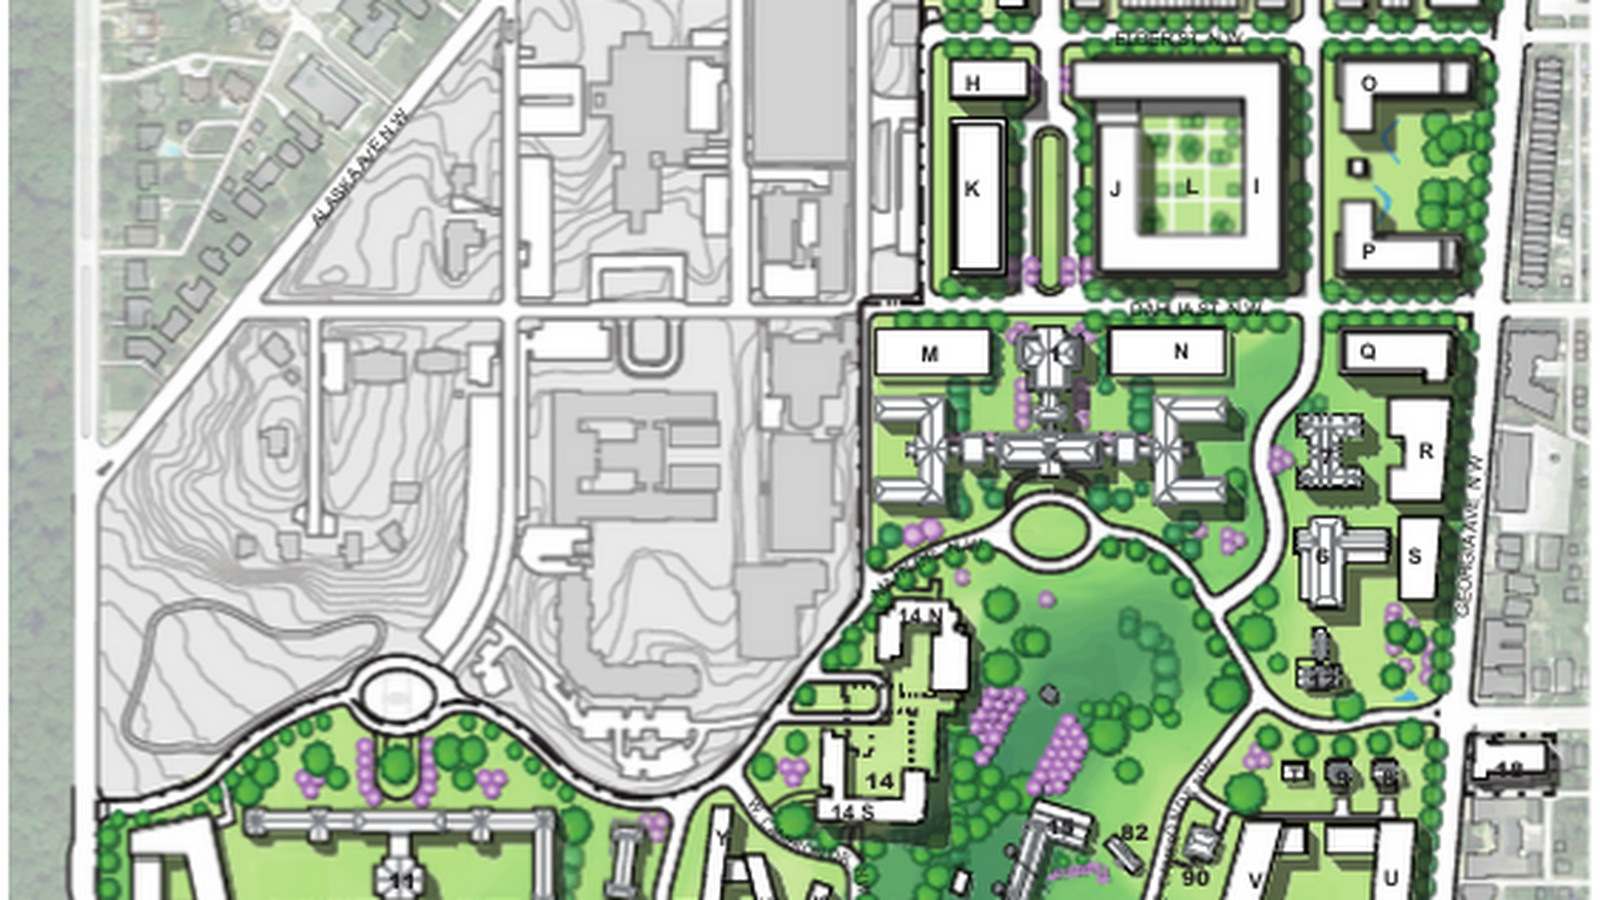 Housing For Homeless Veterans Planned In Walter Reed Site